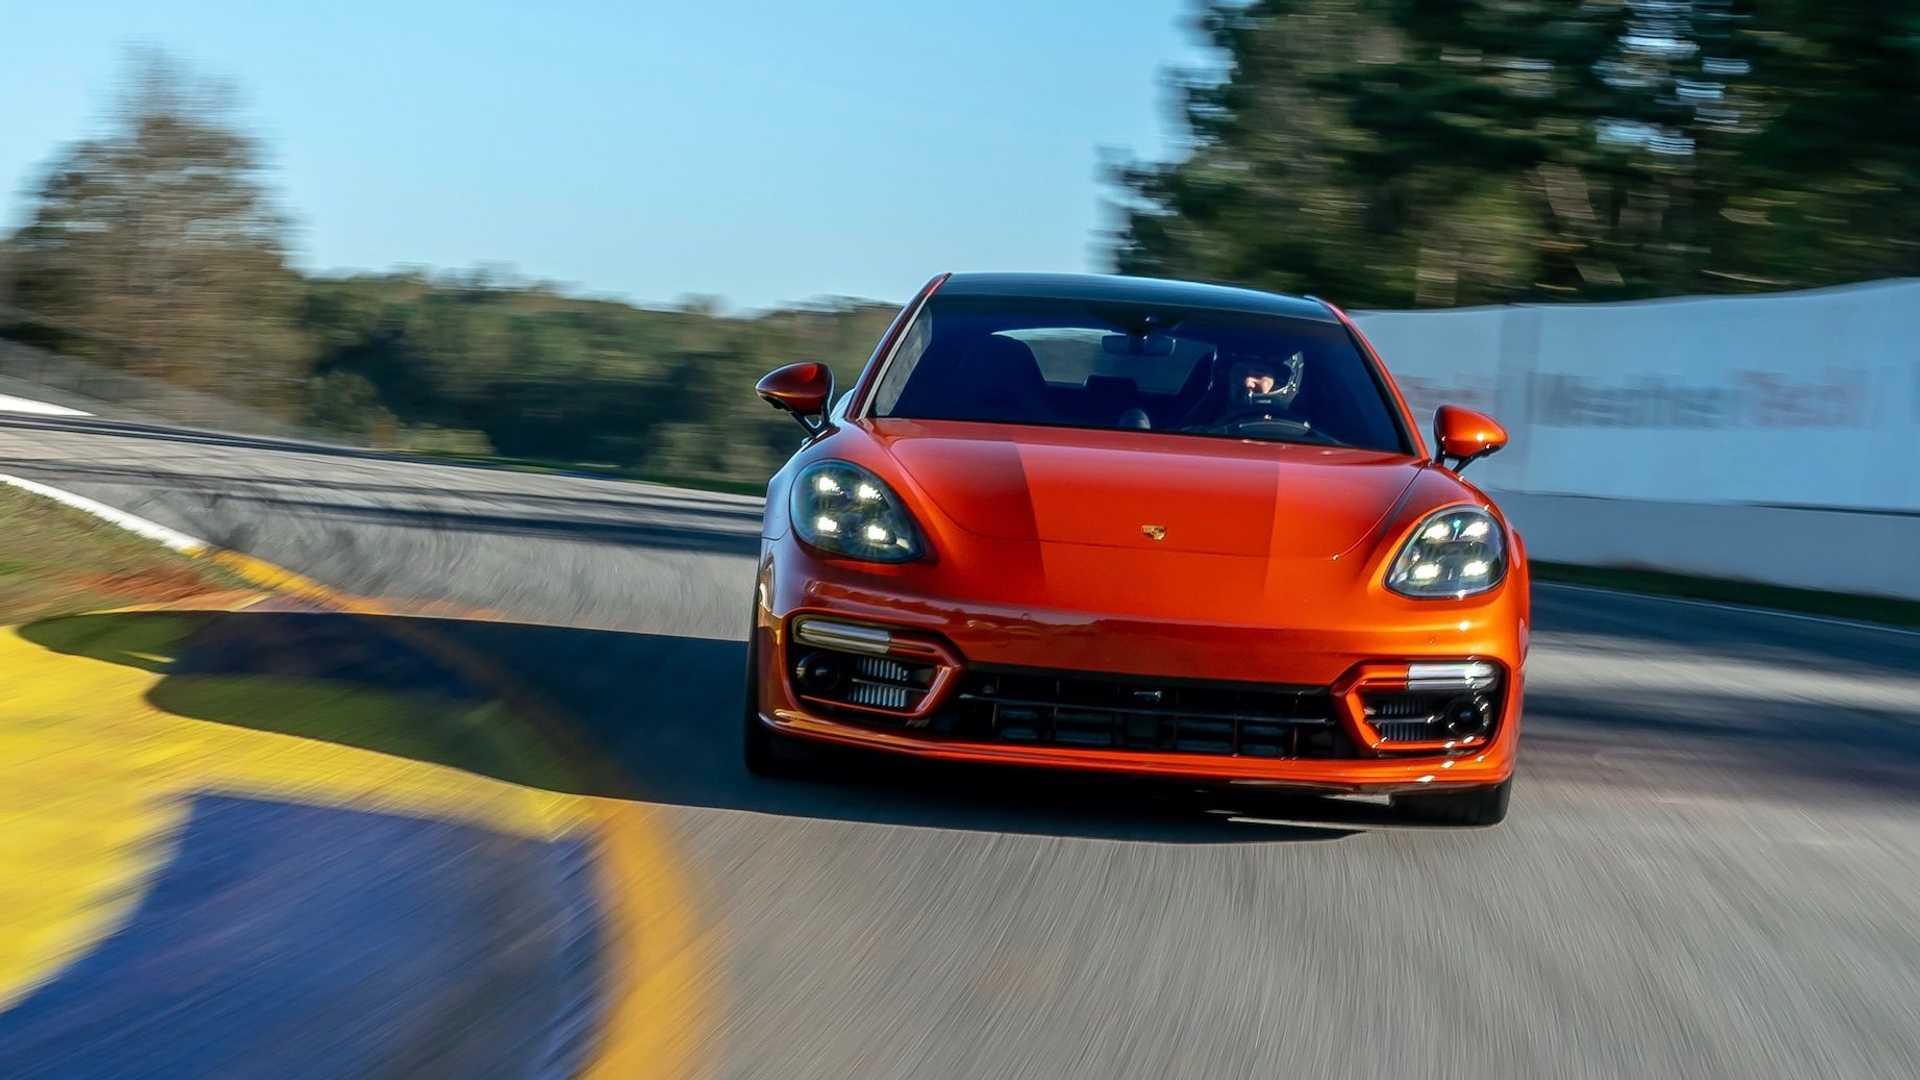 Porsche-Panamera-Turbo-Record-Road-Atlanta-4